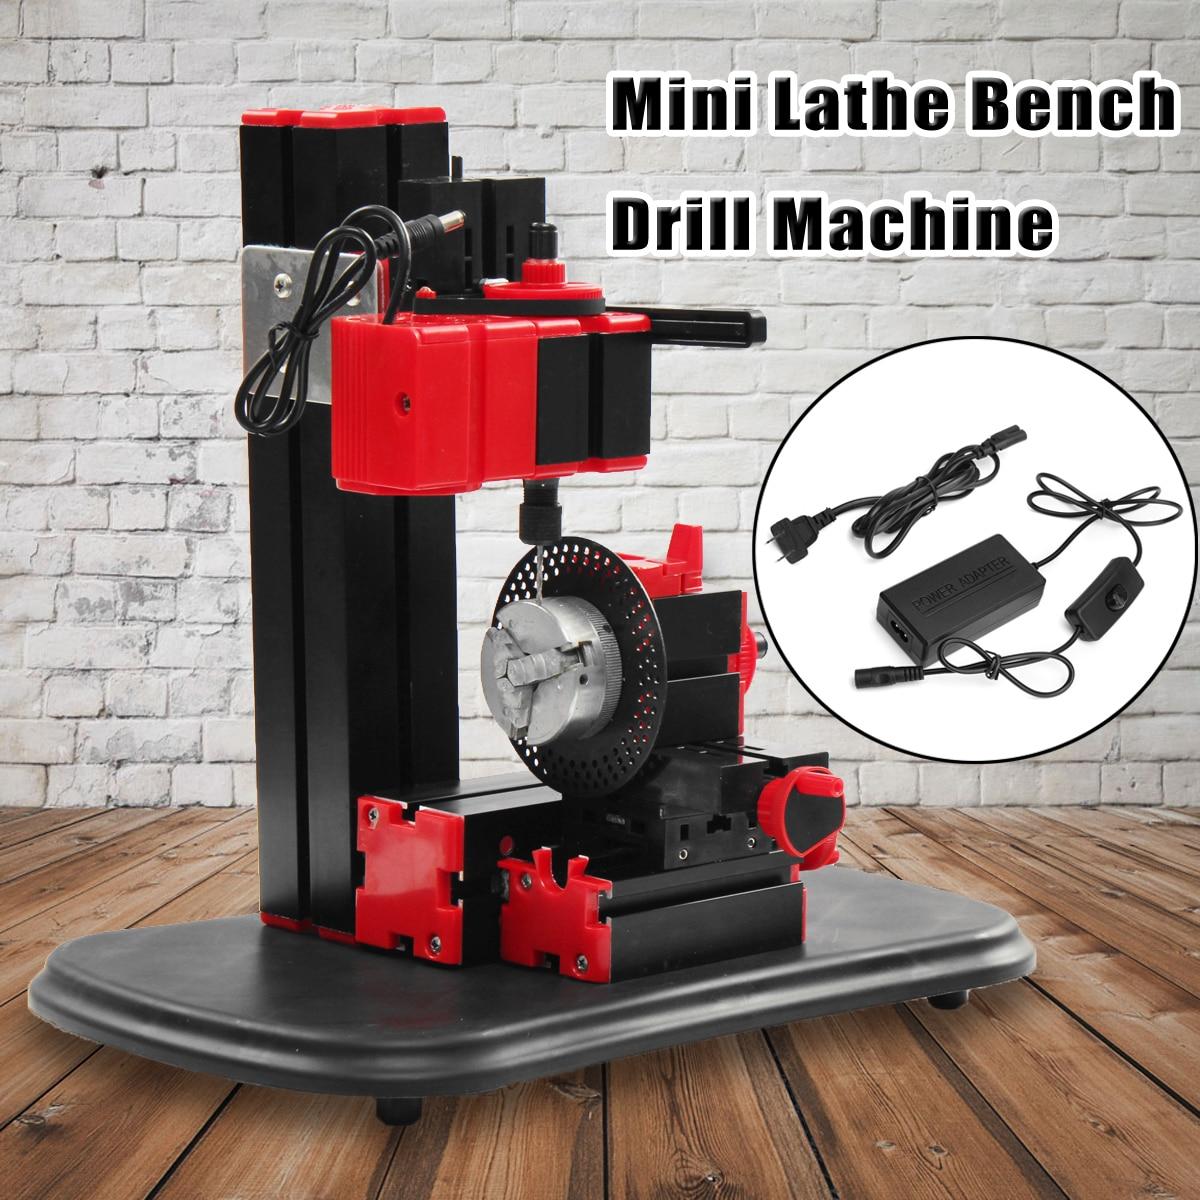 110V-240V Mini Lathe Bench Drill Machine DIY Electric Drill Woodwork Model Making Tool Lathe Milling Machine Kit